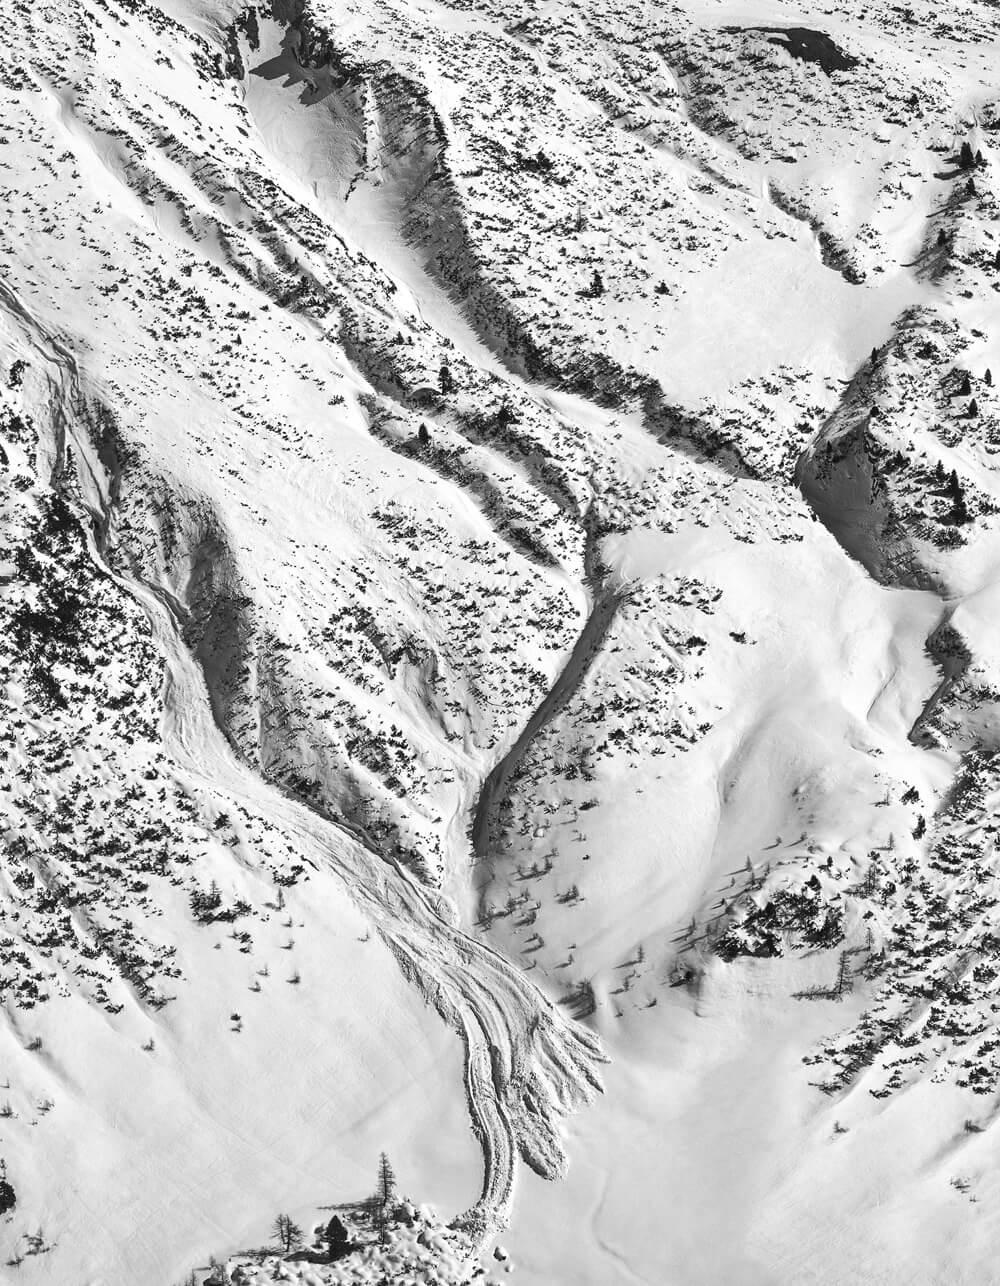 ingo-robin-avalanche